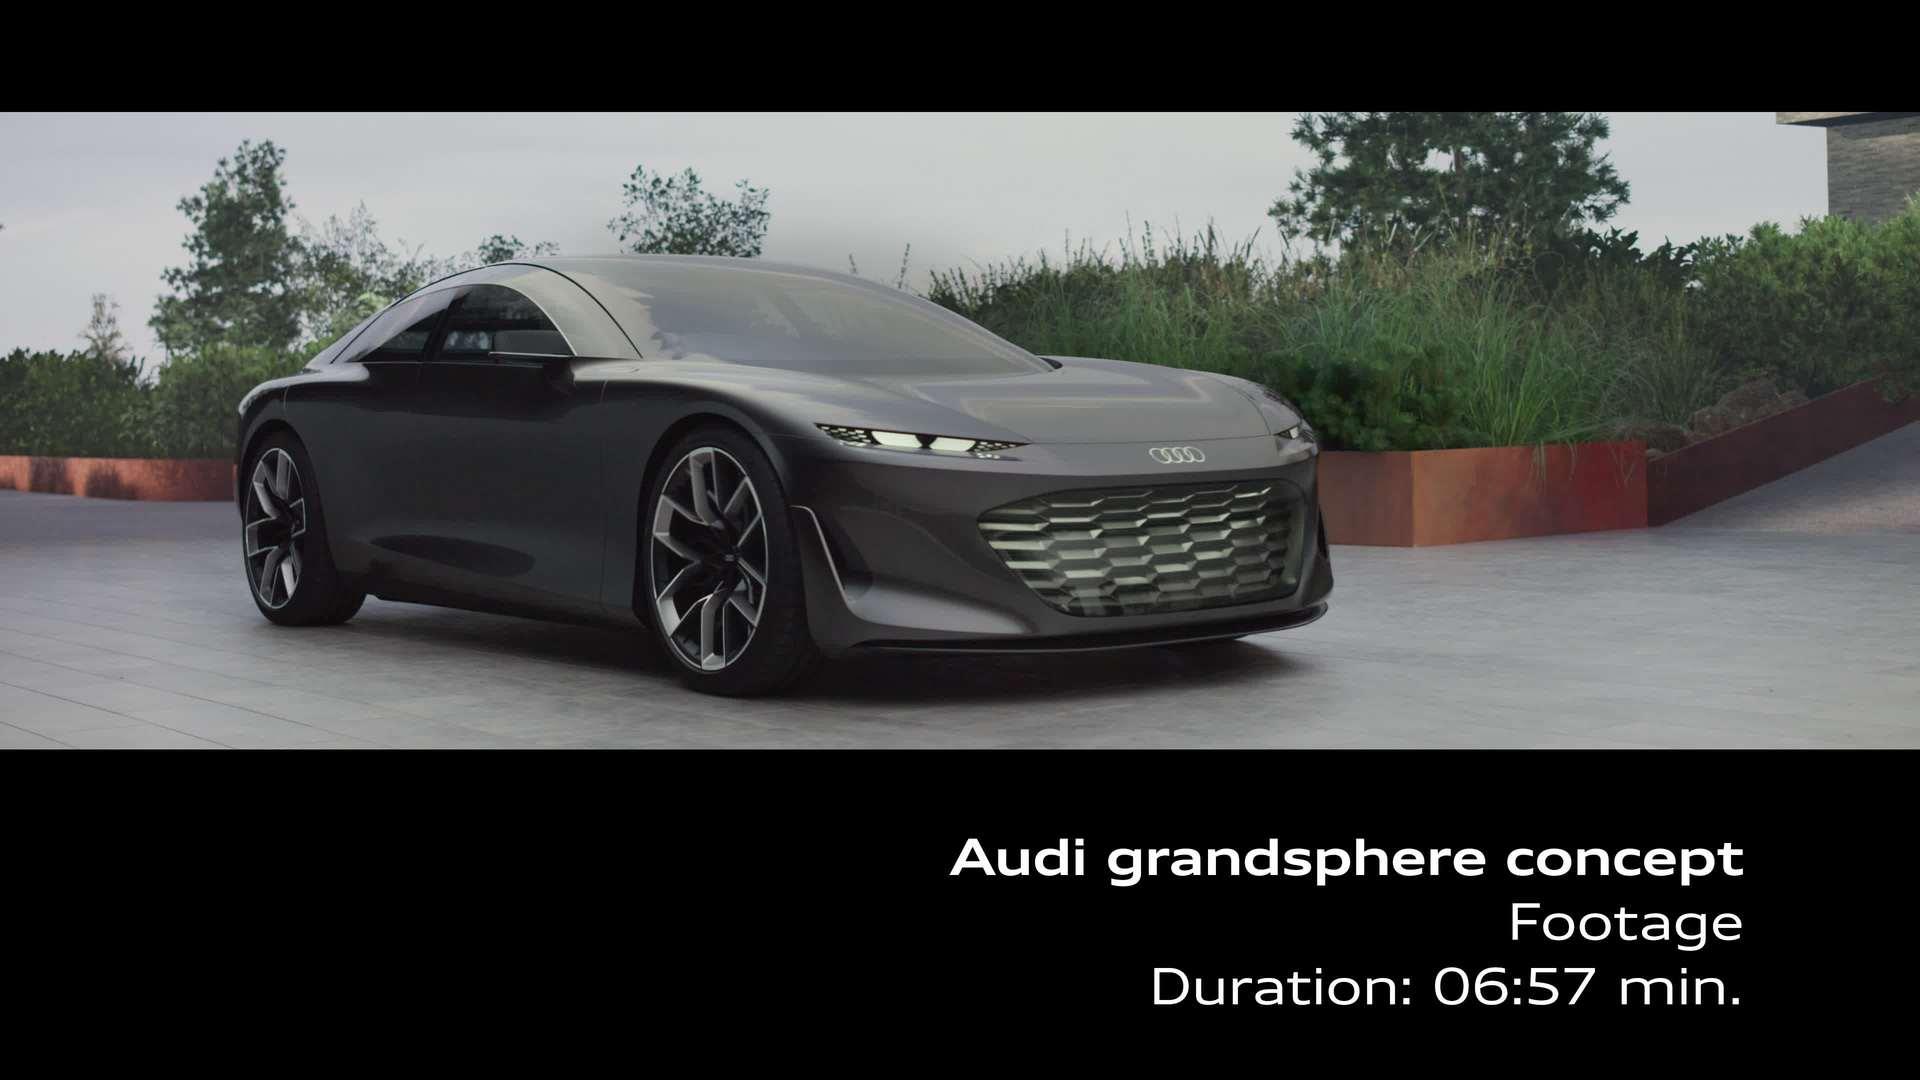 Footage: Driving scenes of the Audi grandsphere concept